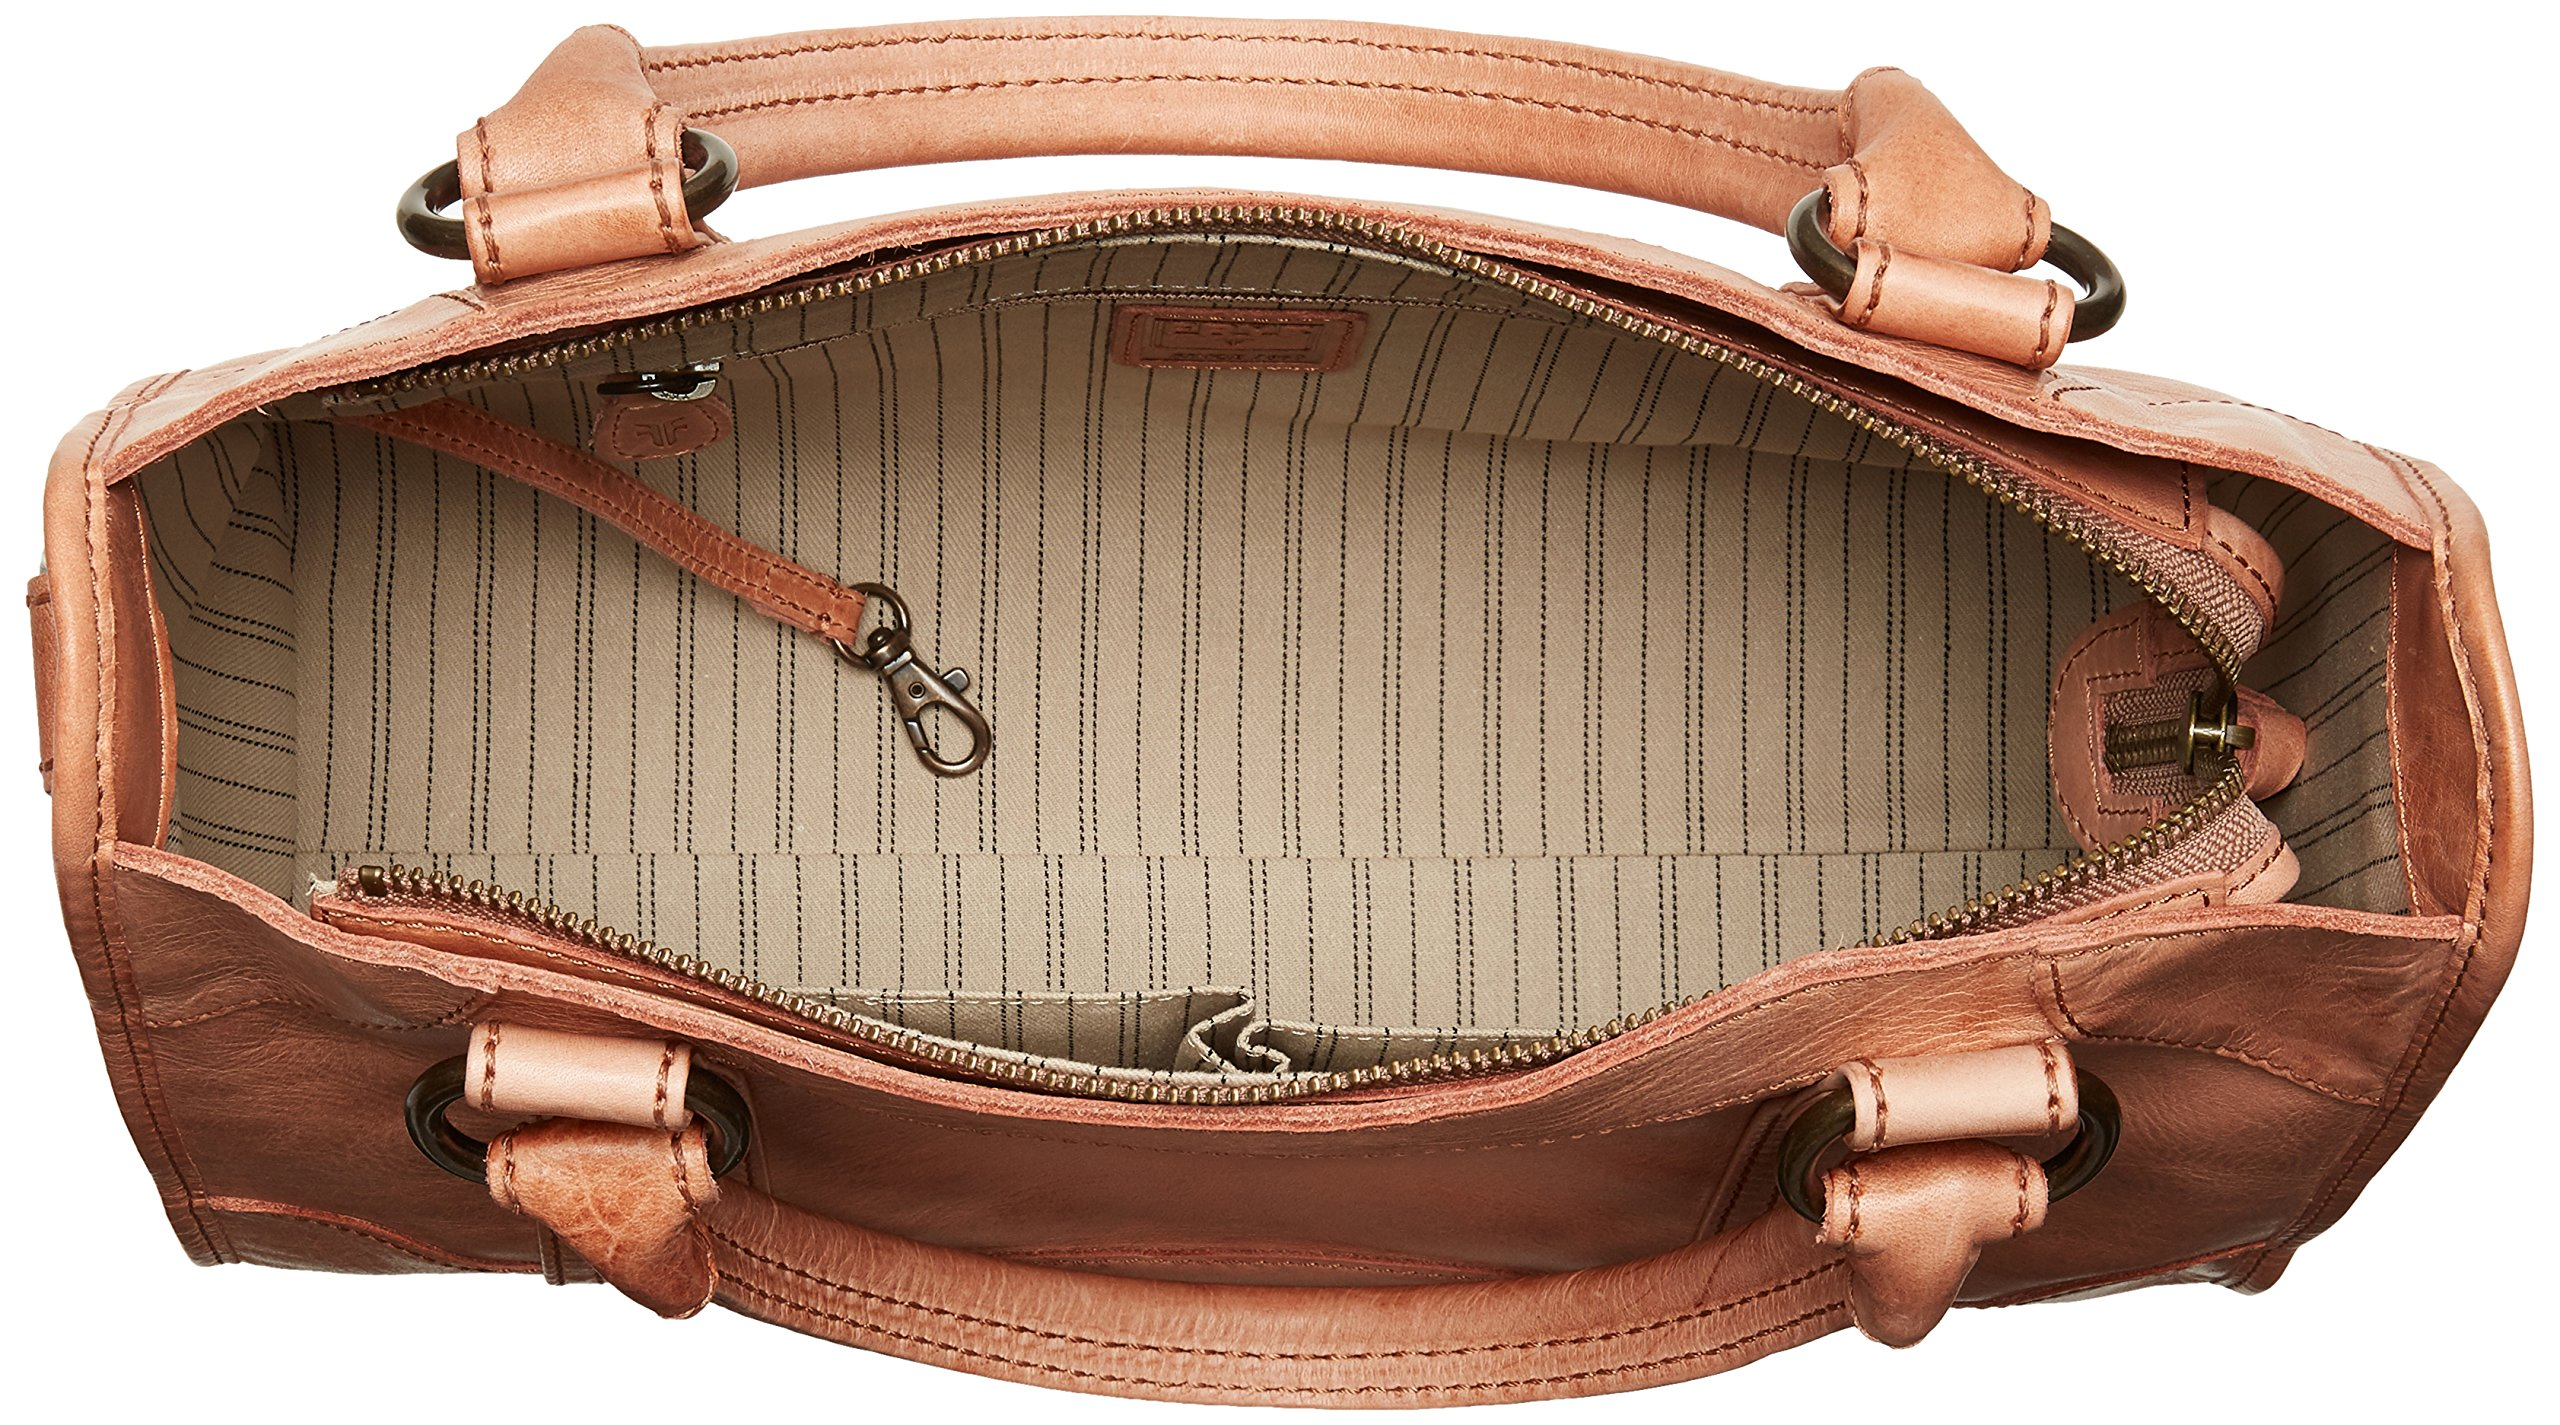 FRYE Melissa Zip Satchel Leather Handbag, dusty rose by FRYE (Image #5)